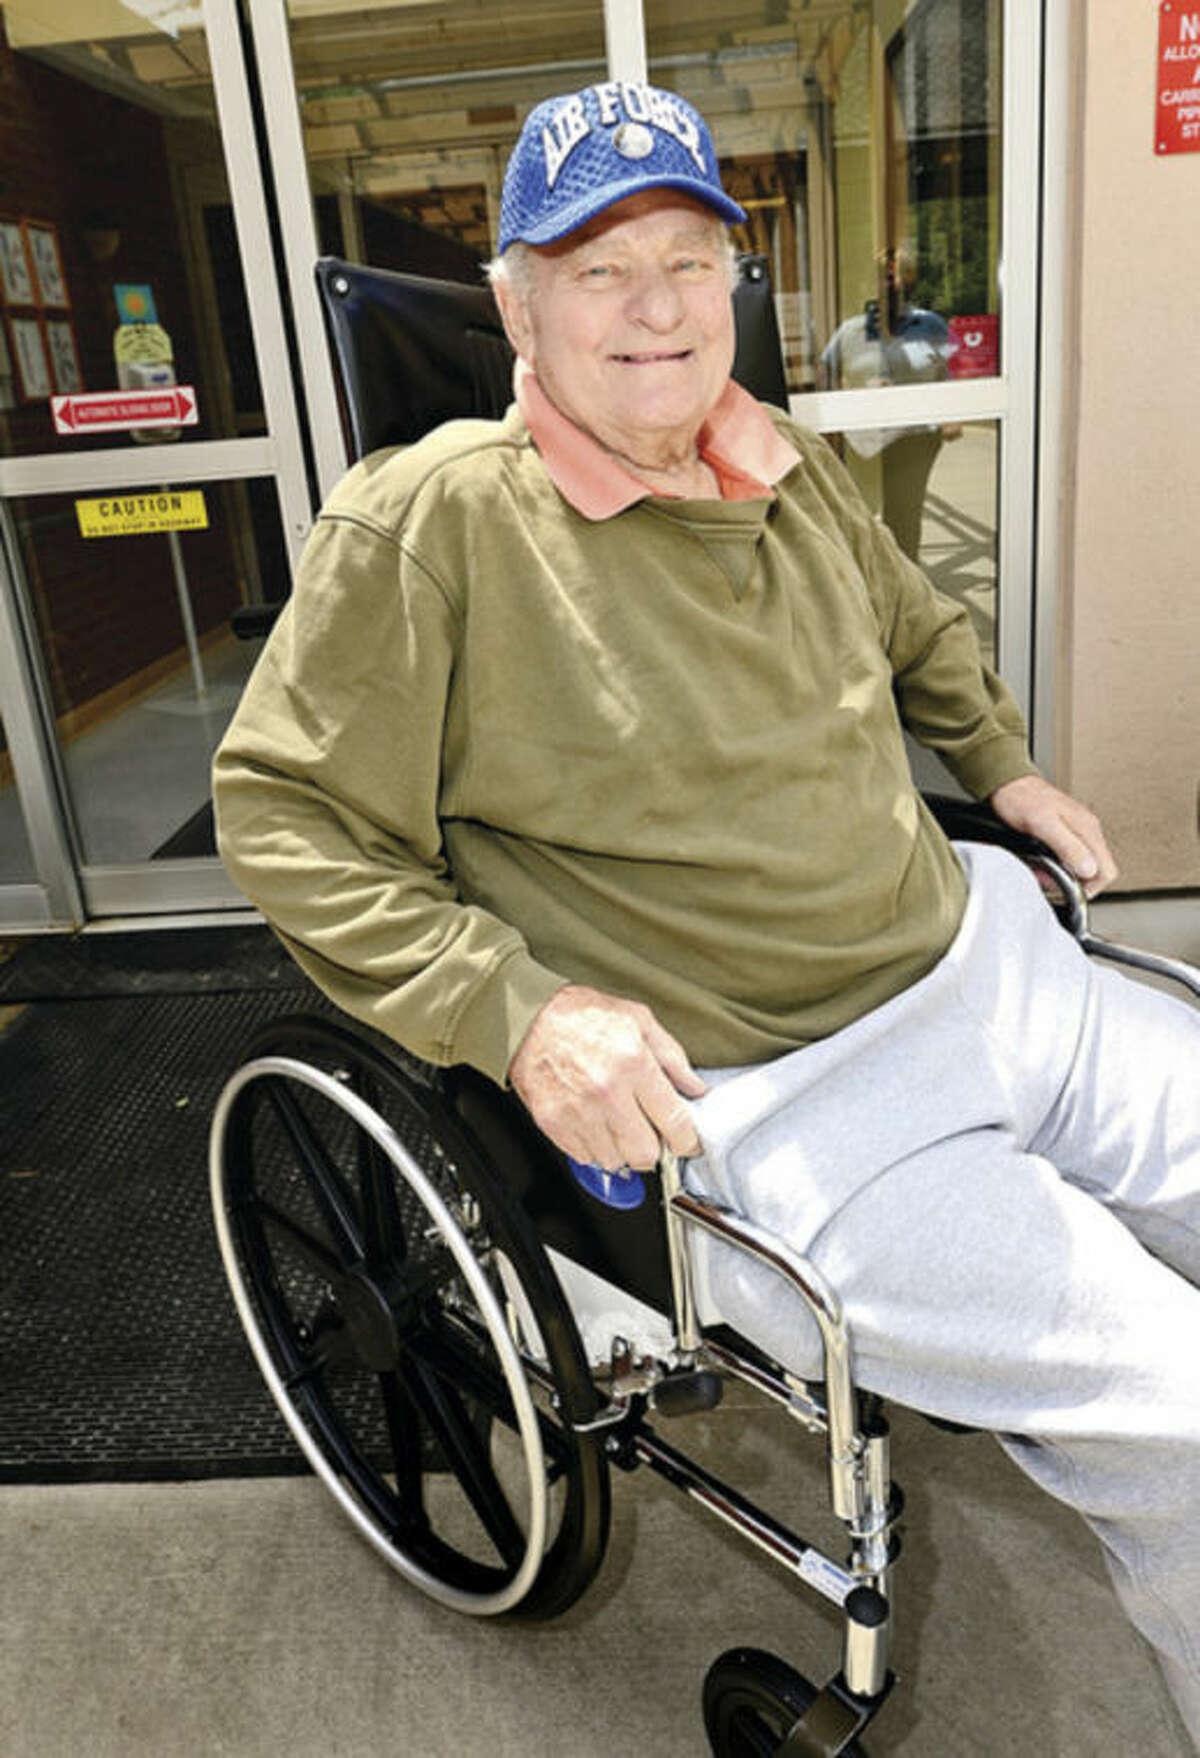 Hour photo / Erik Trautmann Veterans at Aurora Senior Living including John Ruhnke were honored Friday during a veteran's ceremony.